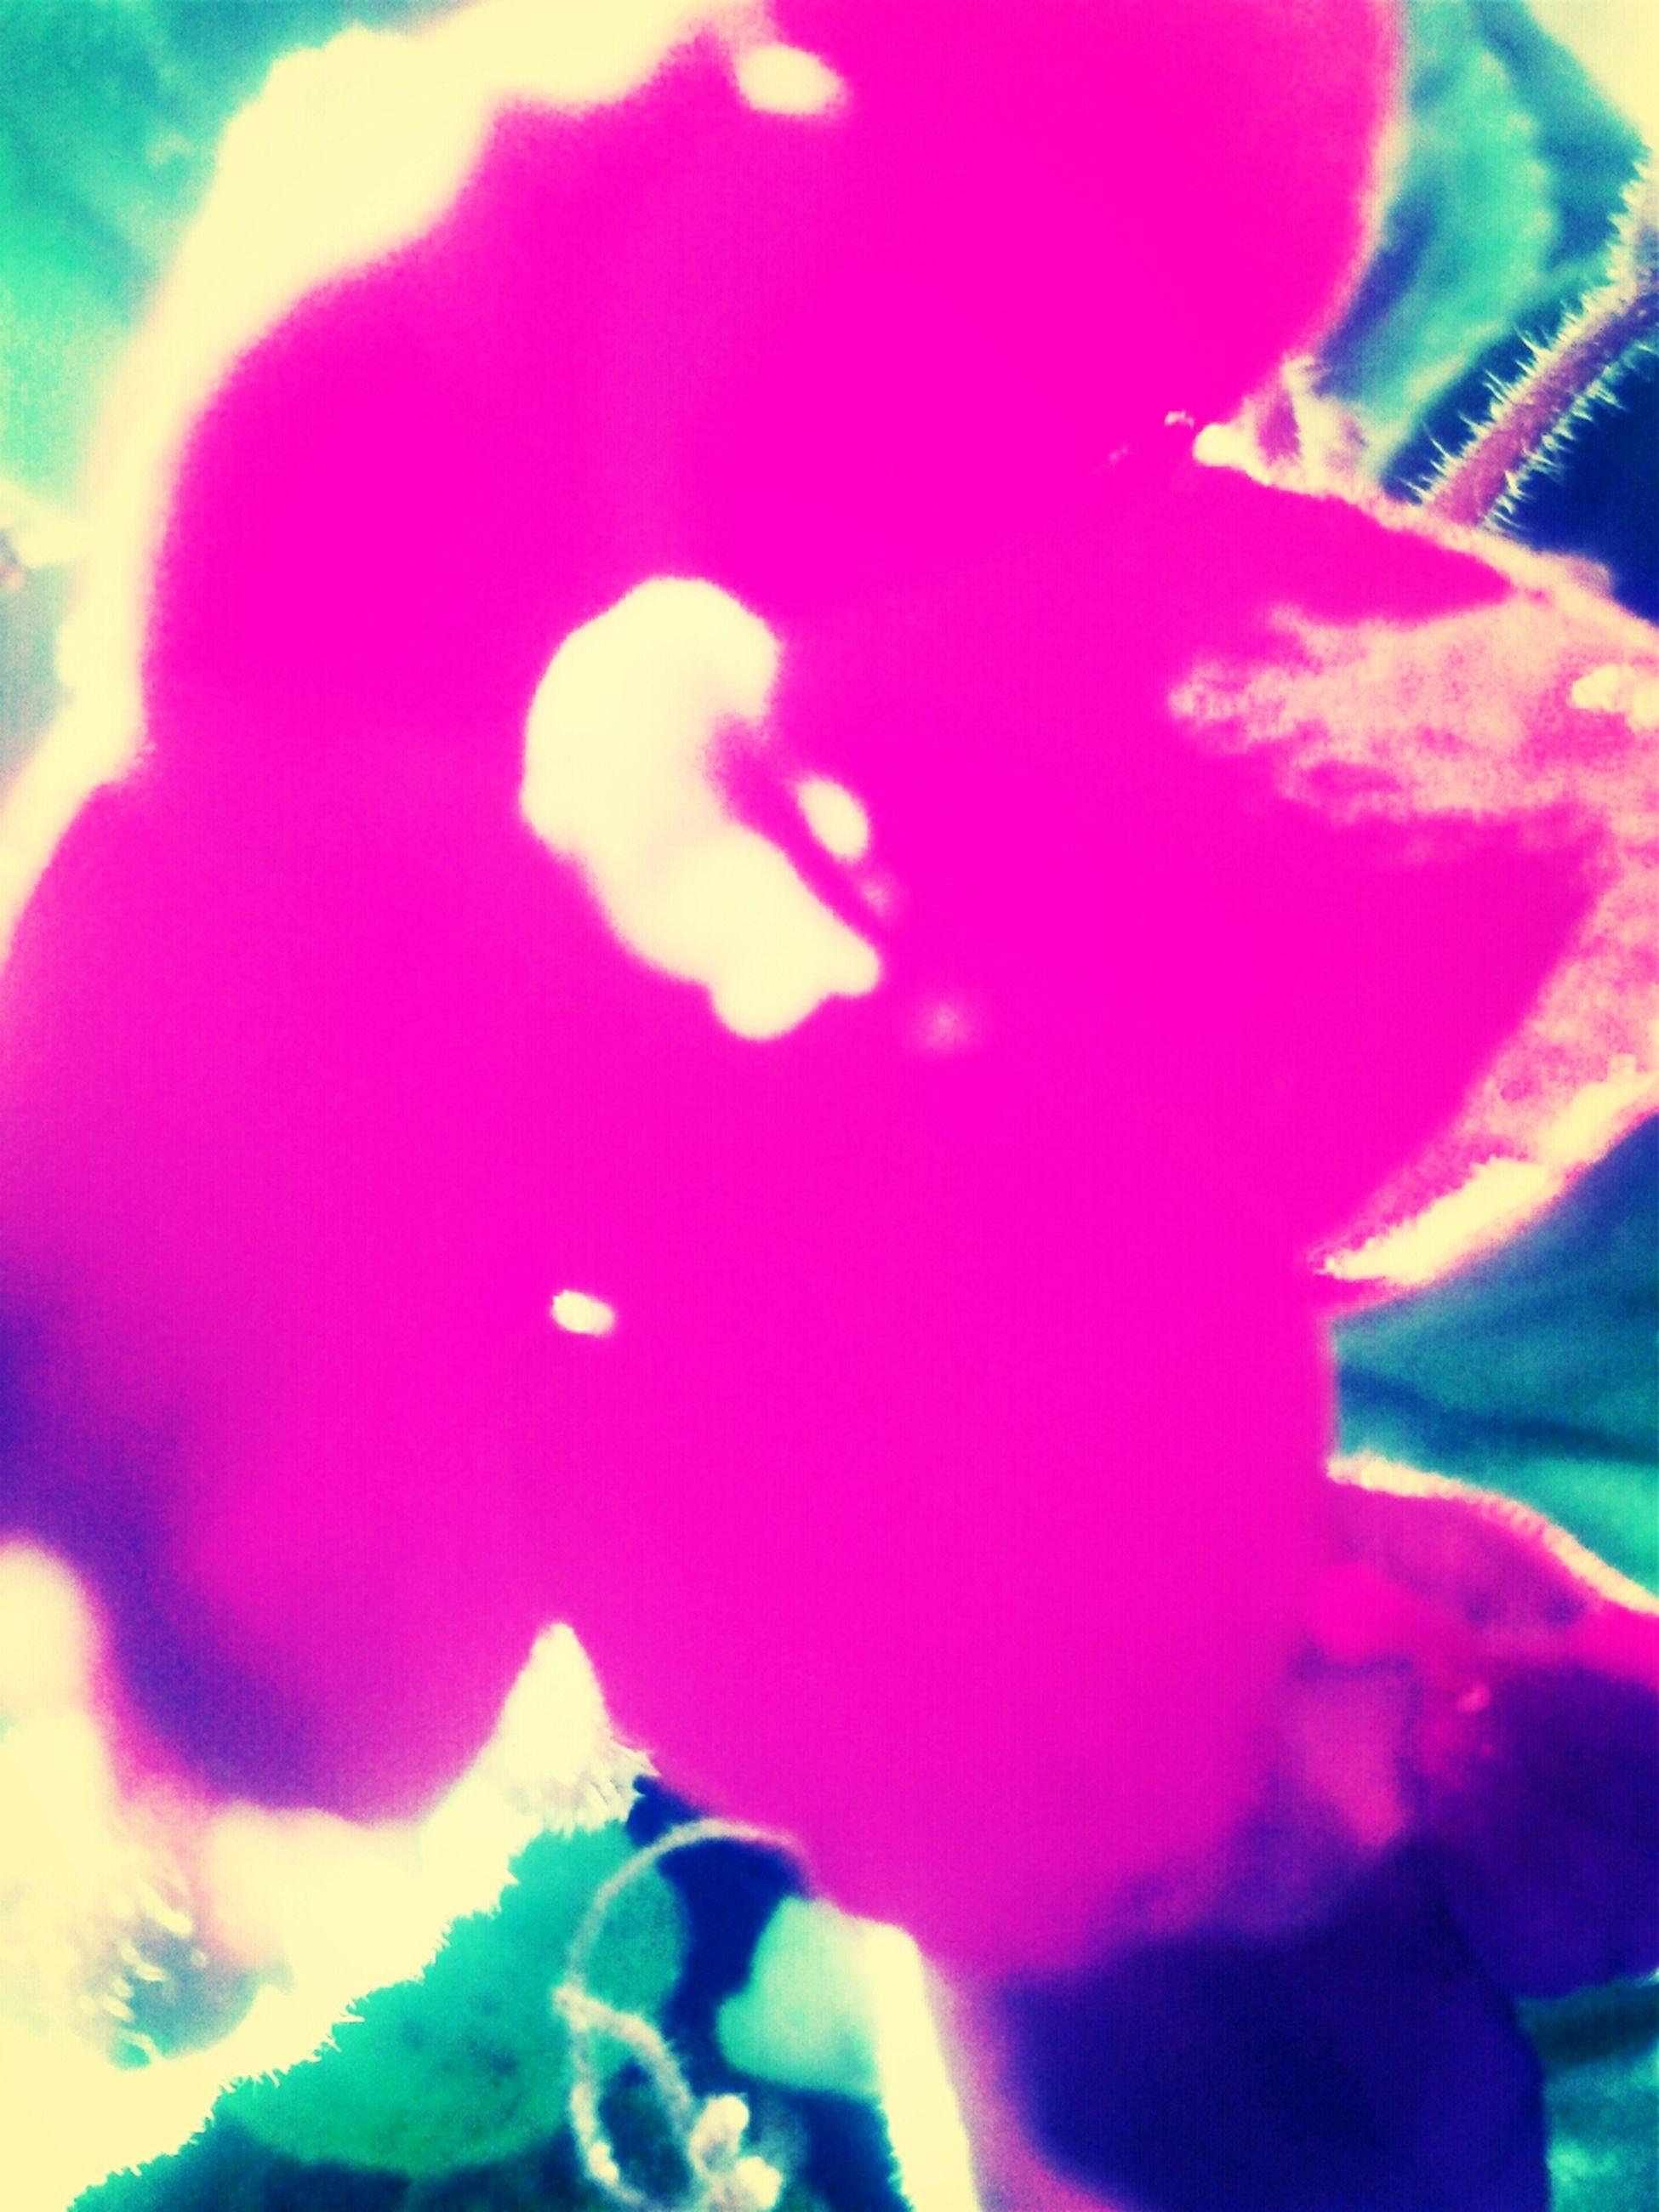 indoors, lifestyles, leisure activity, arts culture and entertainment, illuminated, celebration, men, enjoyment, person, purple, close-up, fun, multi colored, pink color, childhood, light - natural phenomenon, headshot